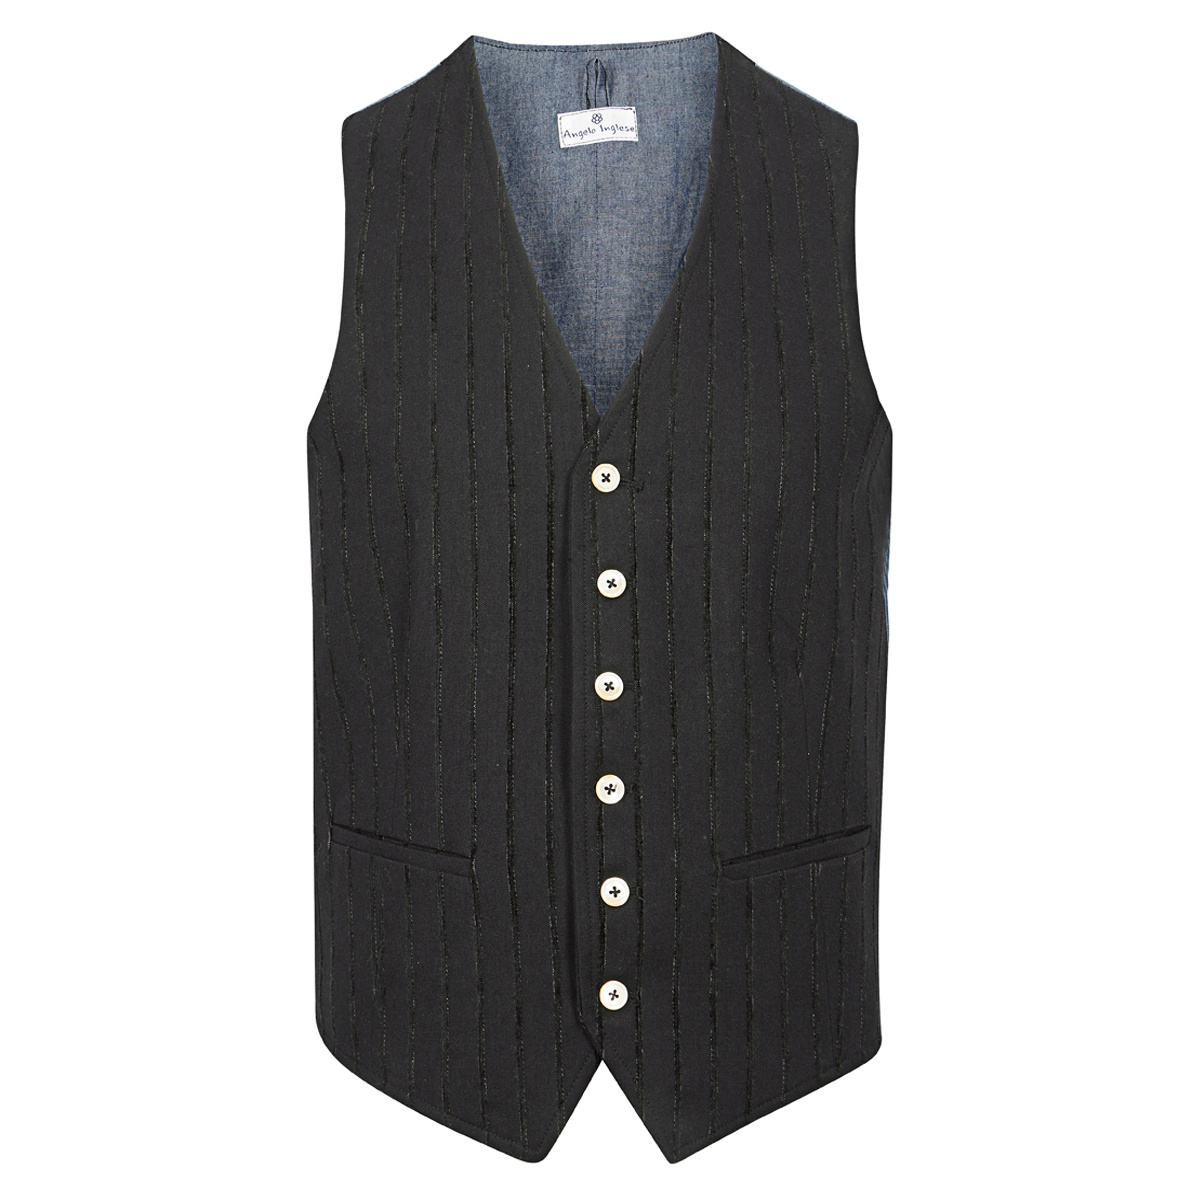 Black Striped Cotton Waistcoat